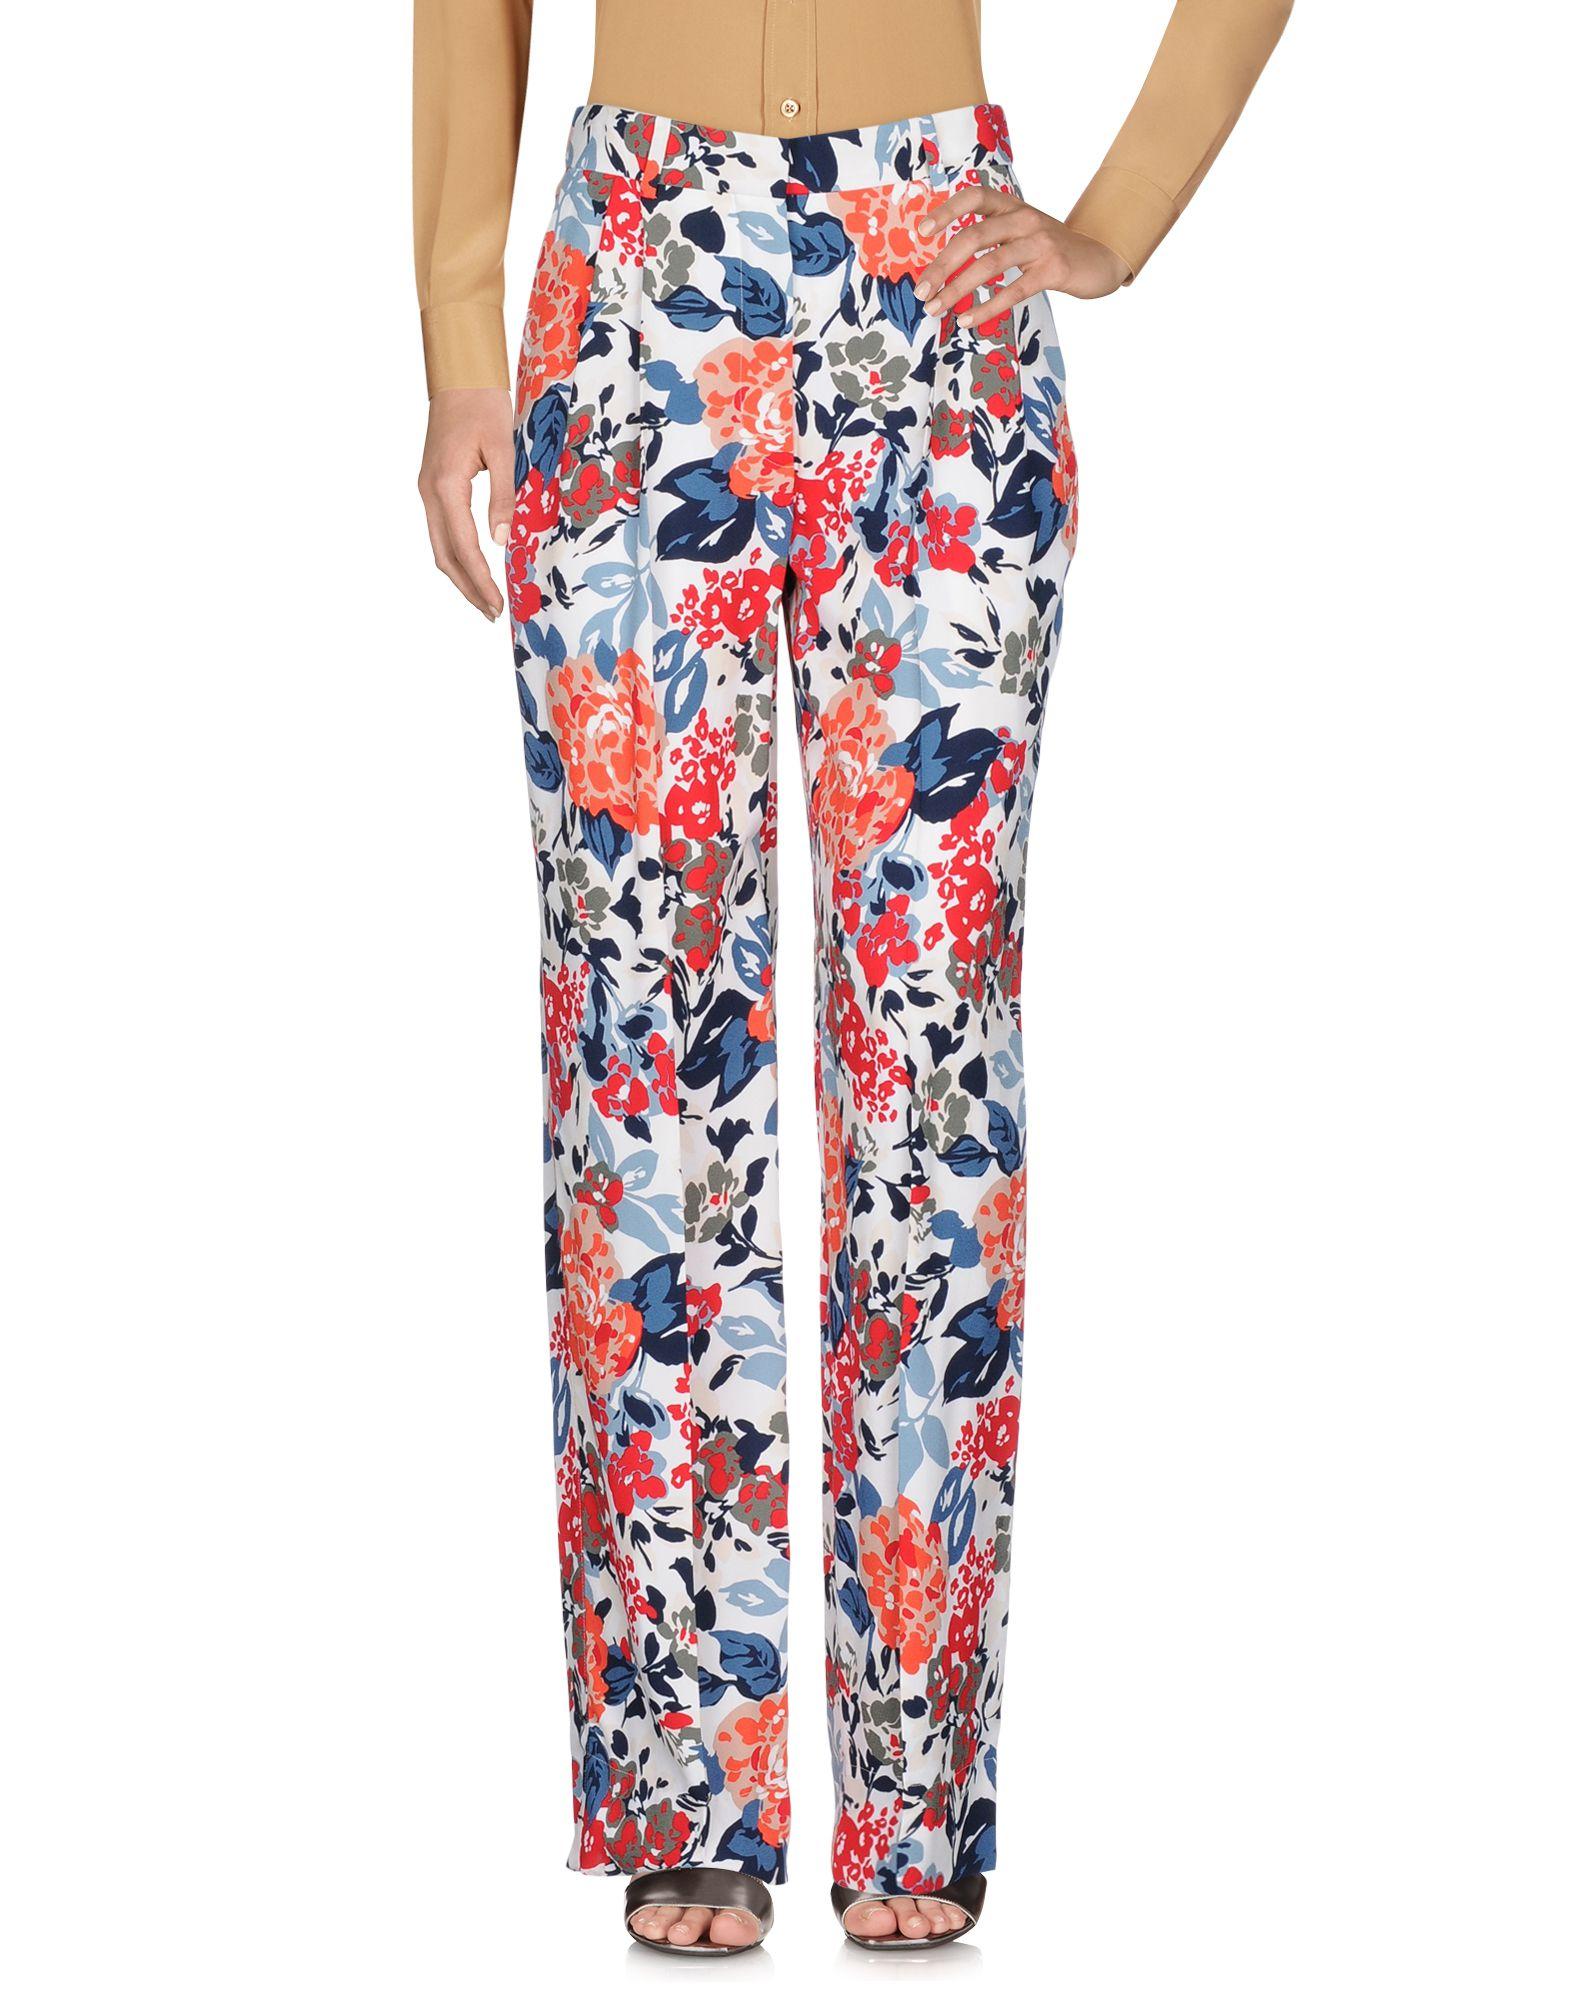 Pantalone Sonia Rykiel Donna - Acquista online su ljpT7BLGCX